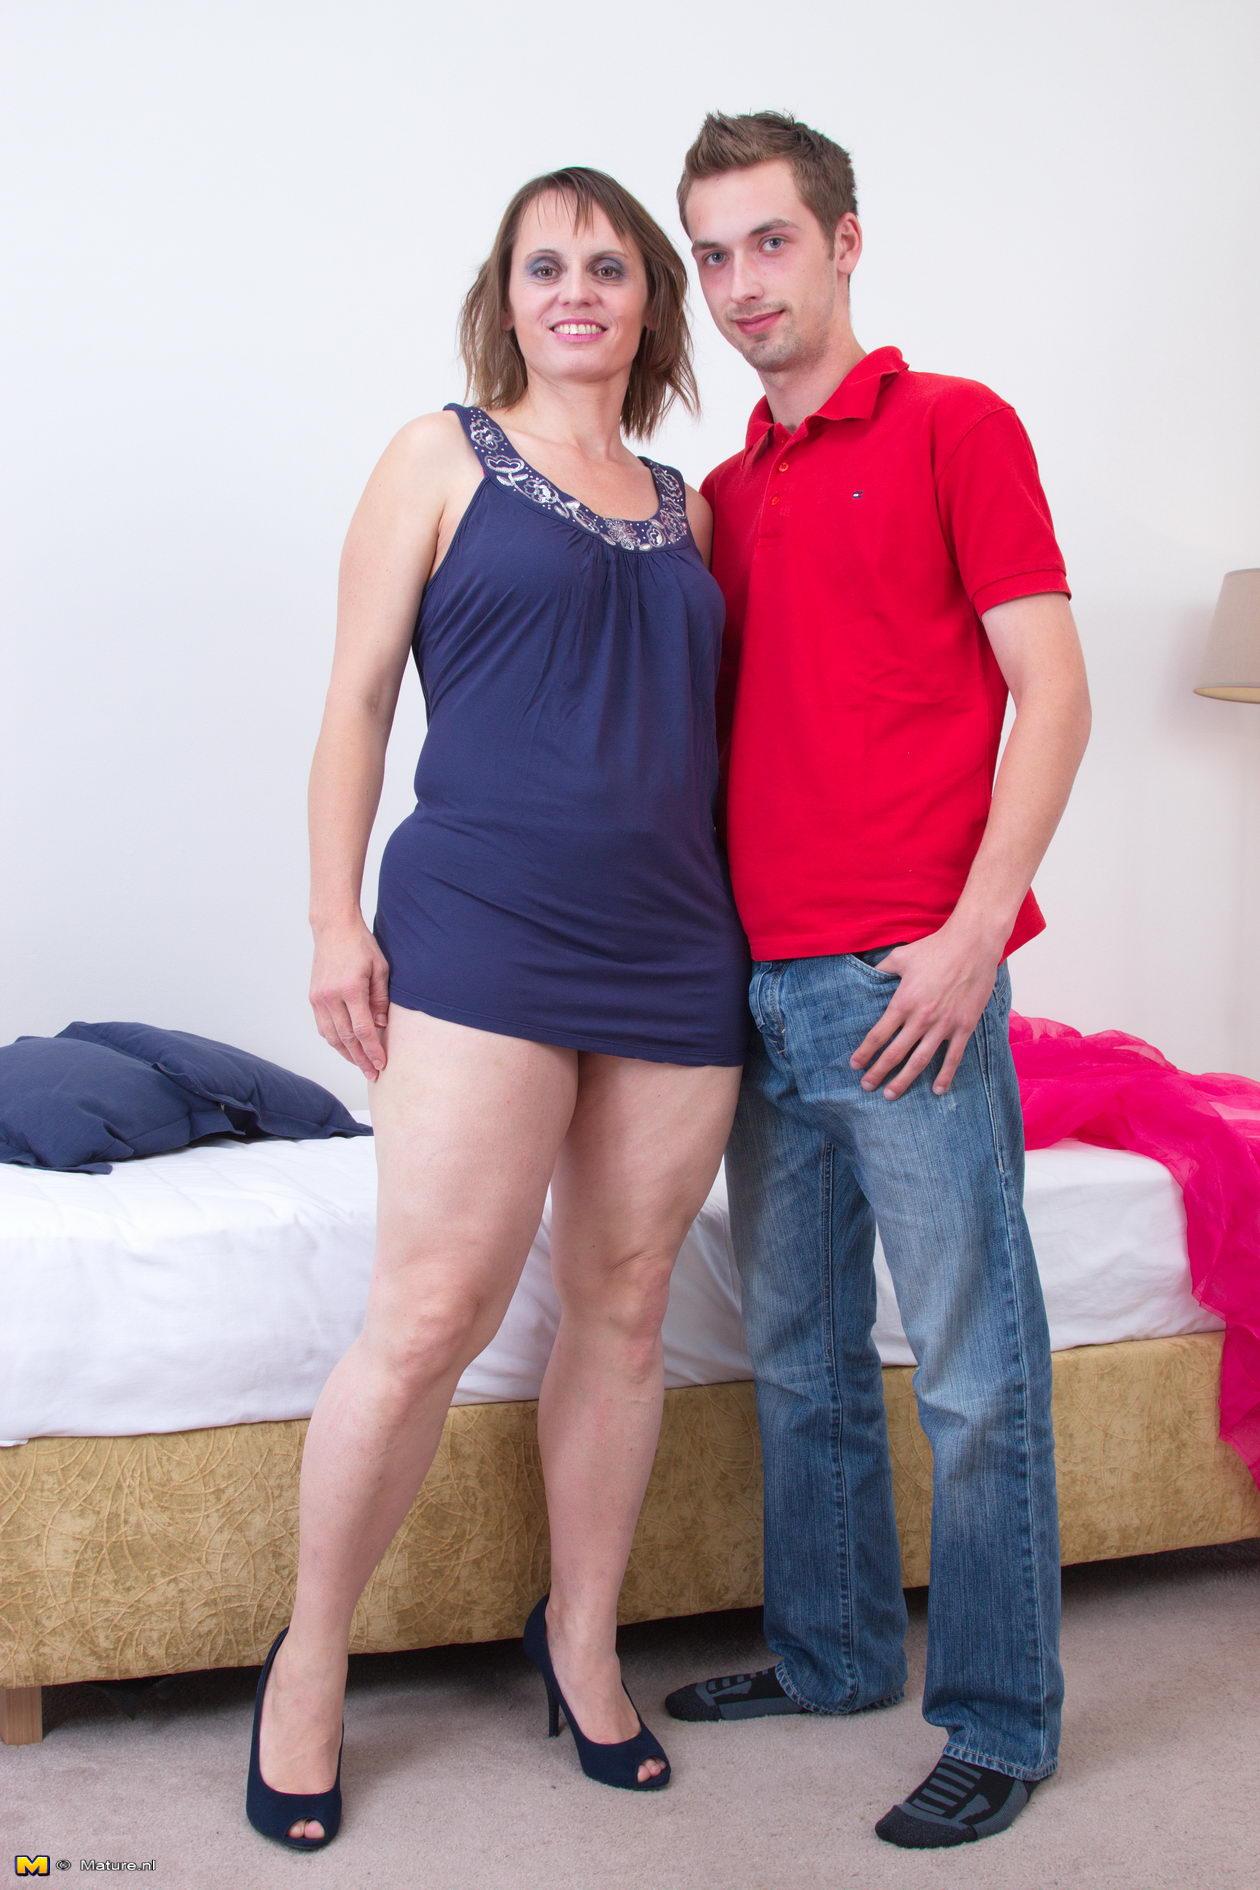 mom hairy porn leg